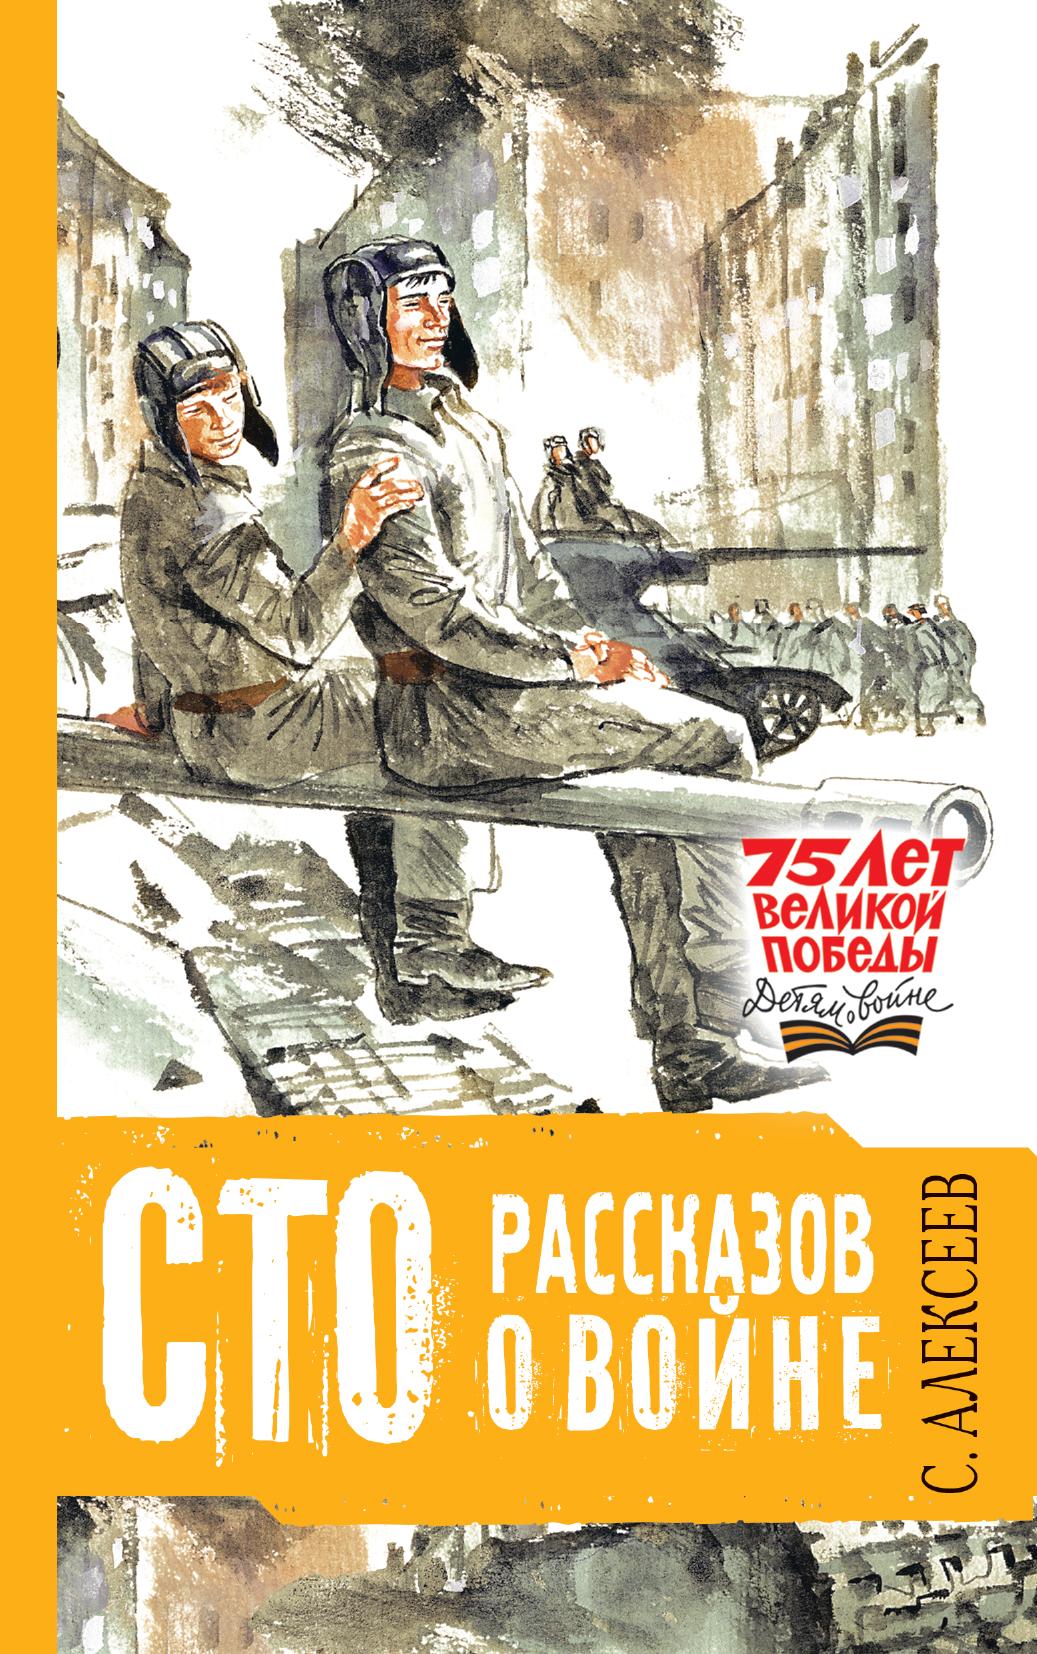 Алексеев С.П. Сто рассказов о войне алексеев с сто рассказов о войне